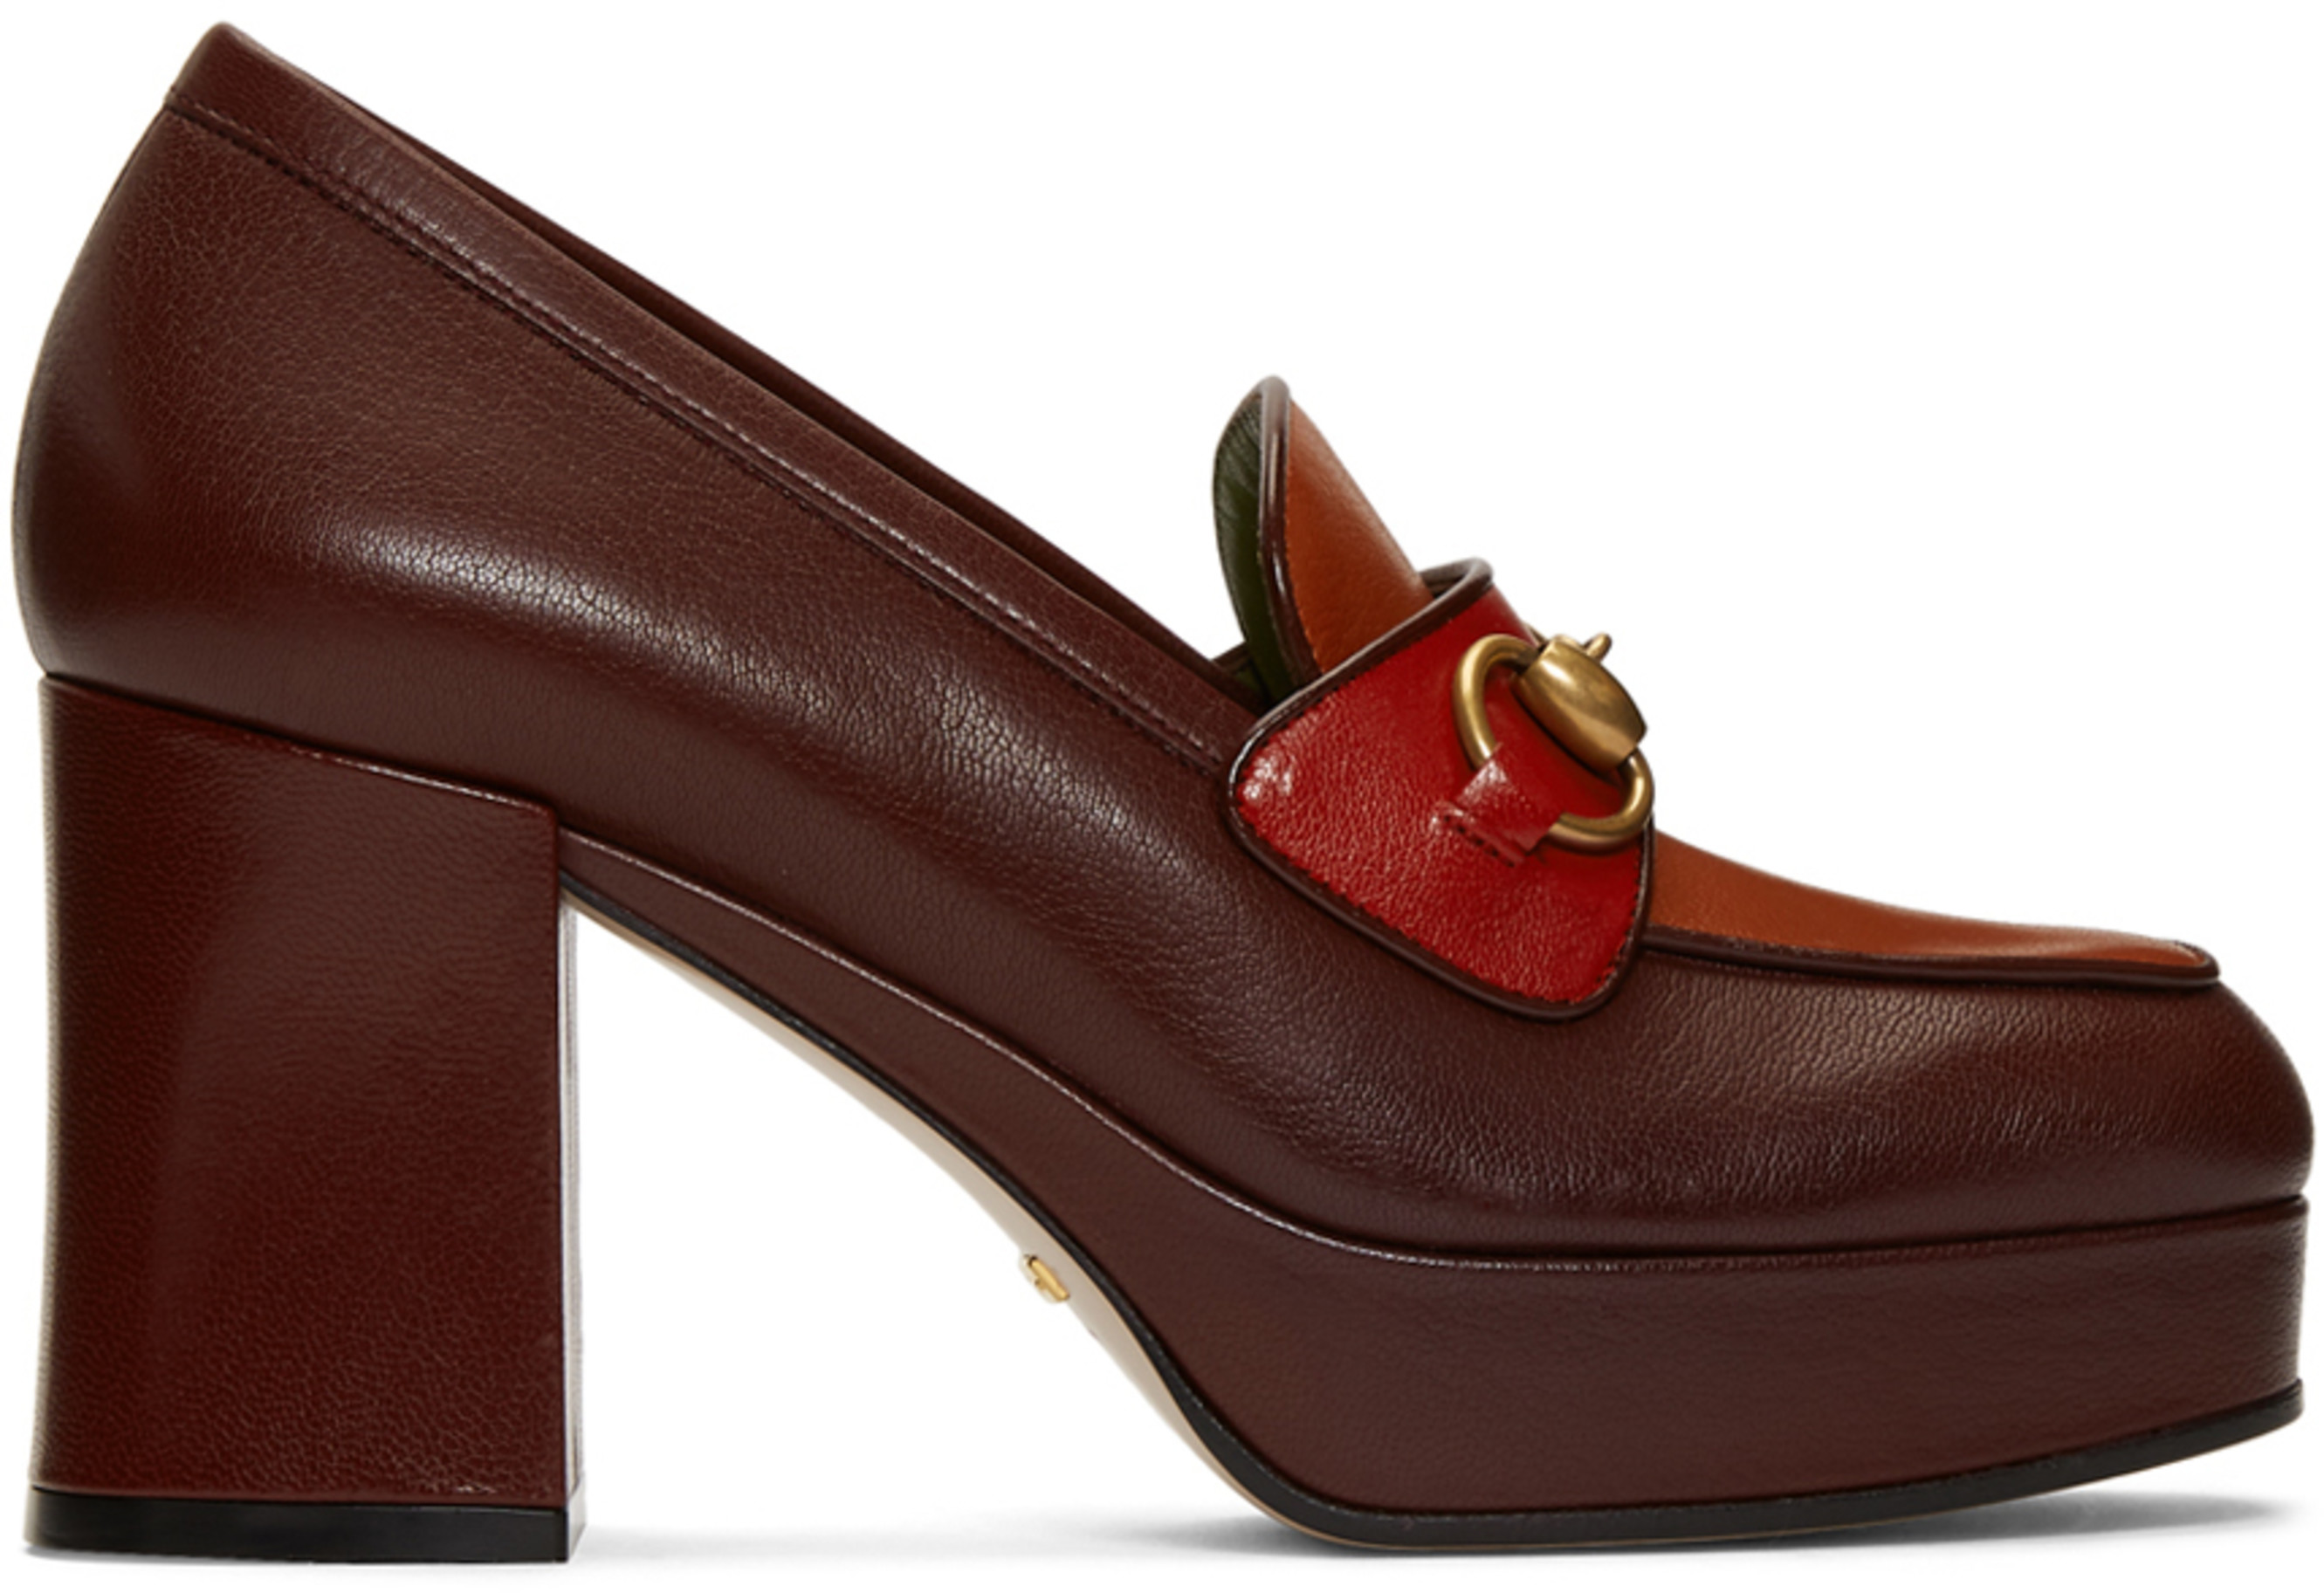 Burgundyamp; Houdan 85 Horsebit Heels Red Igm7Ybf6yv